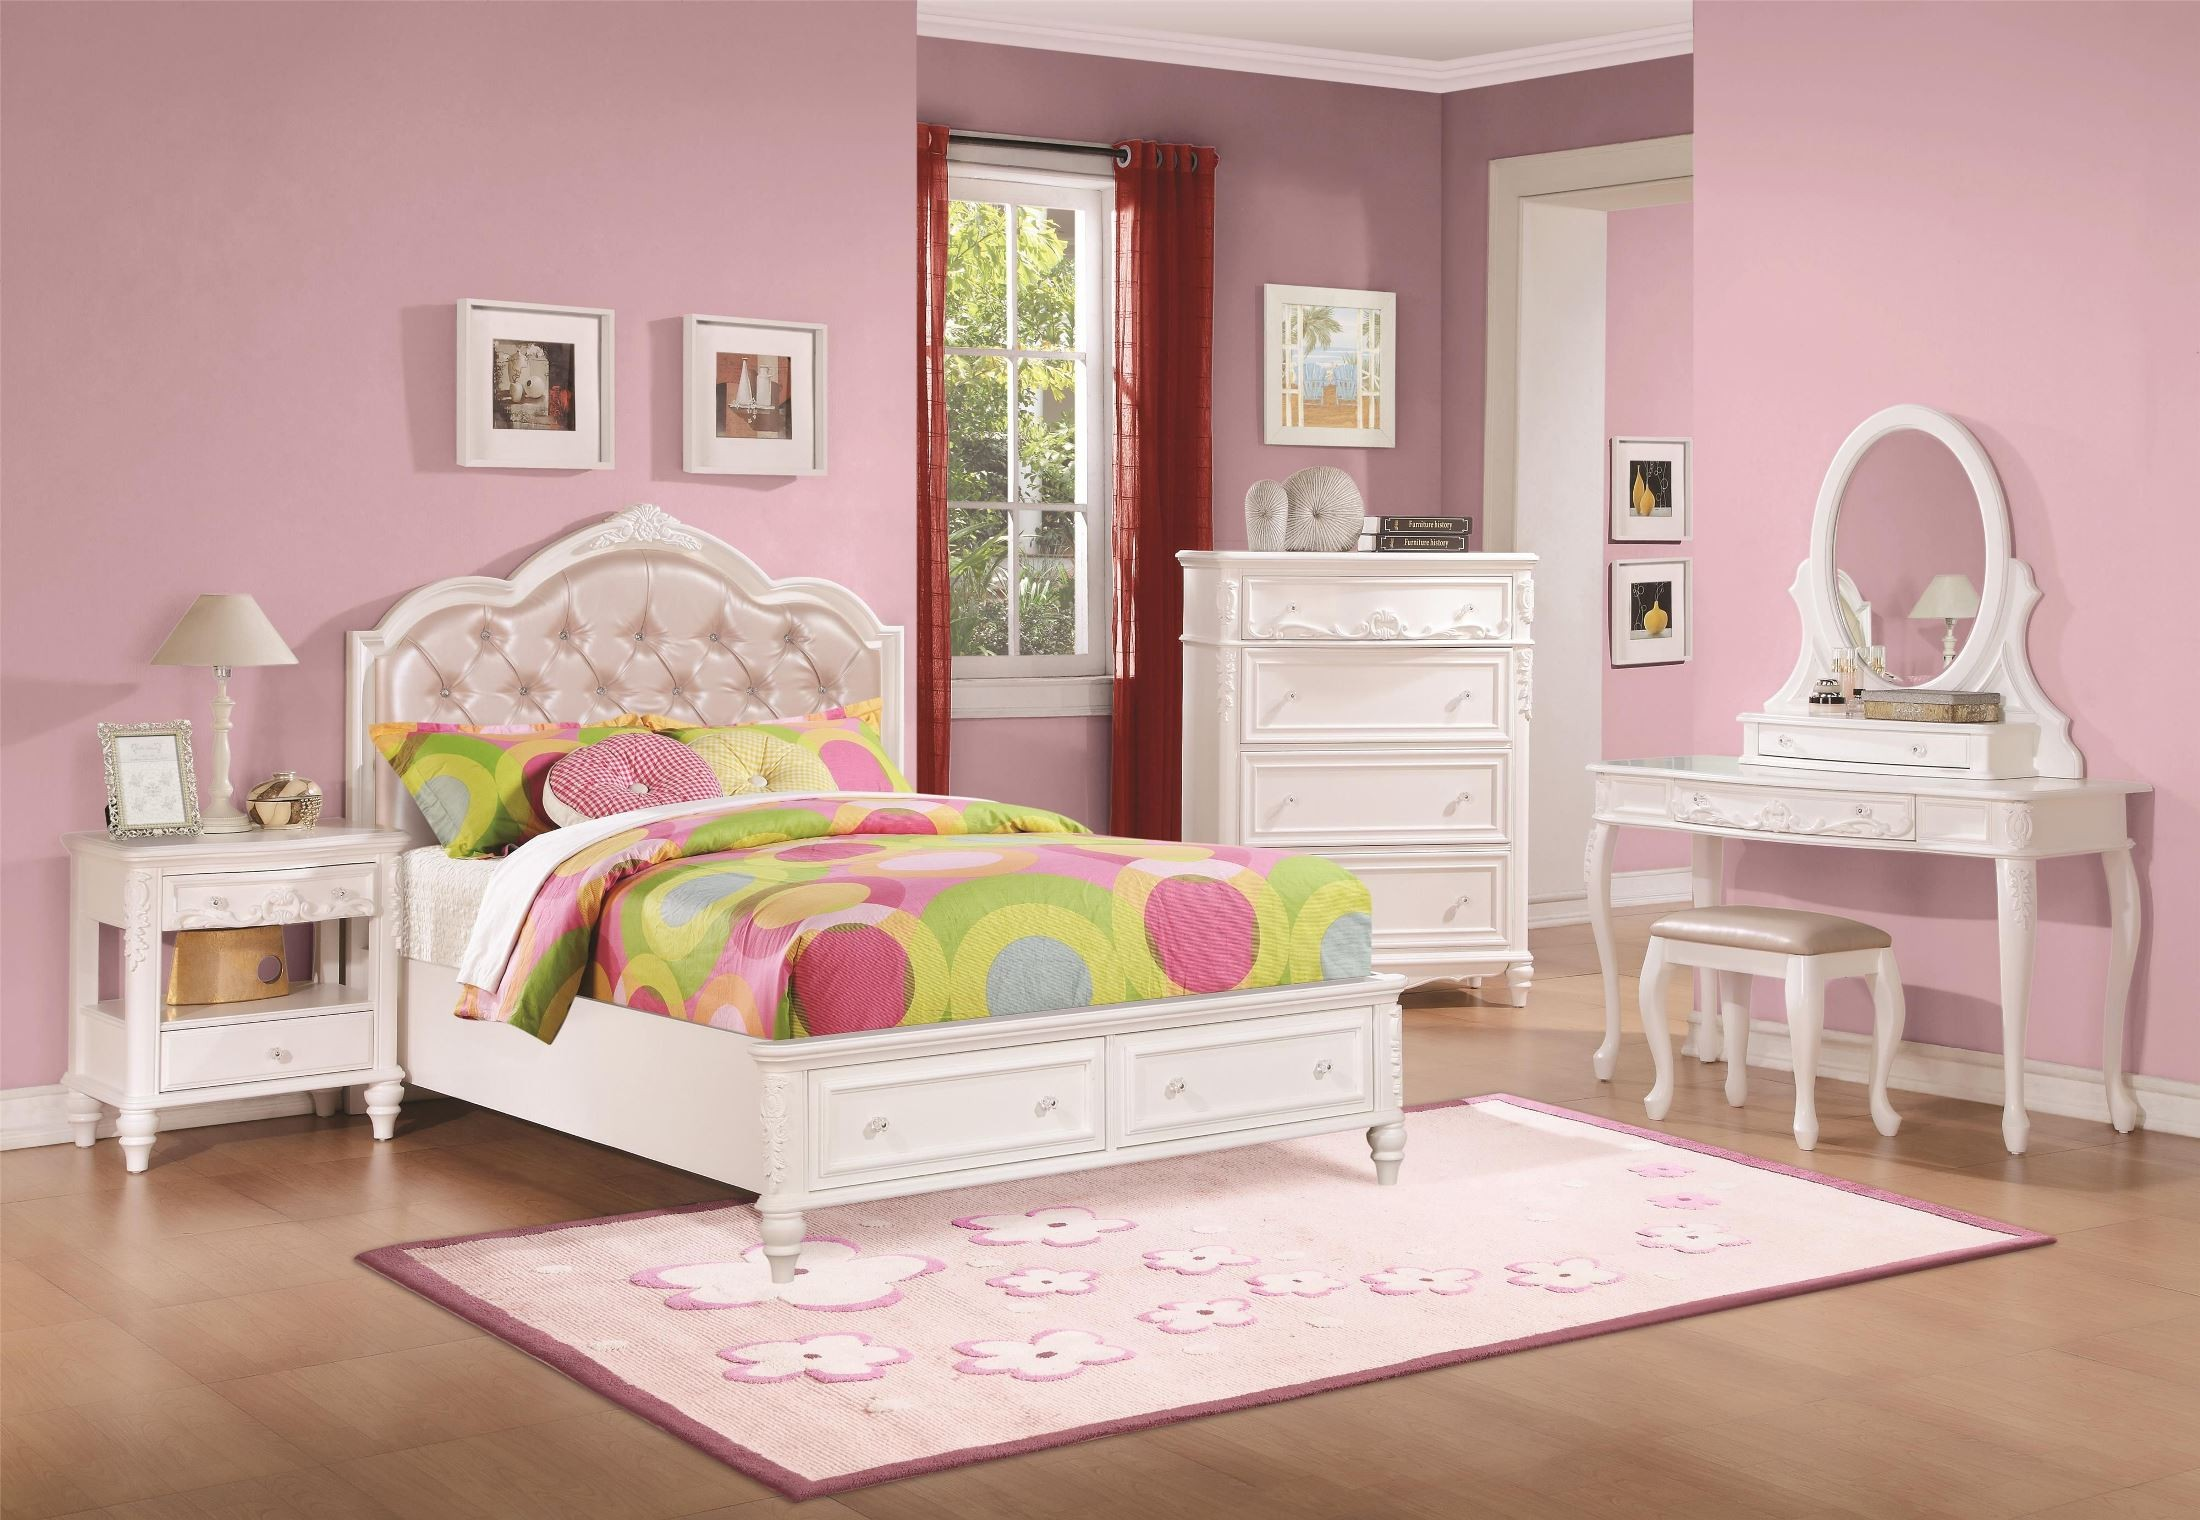 caroline diamond tufted youth storage platform bedroom set